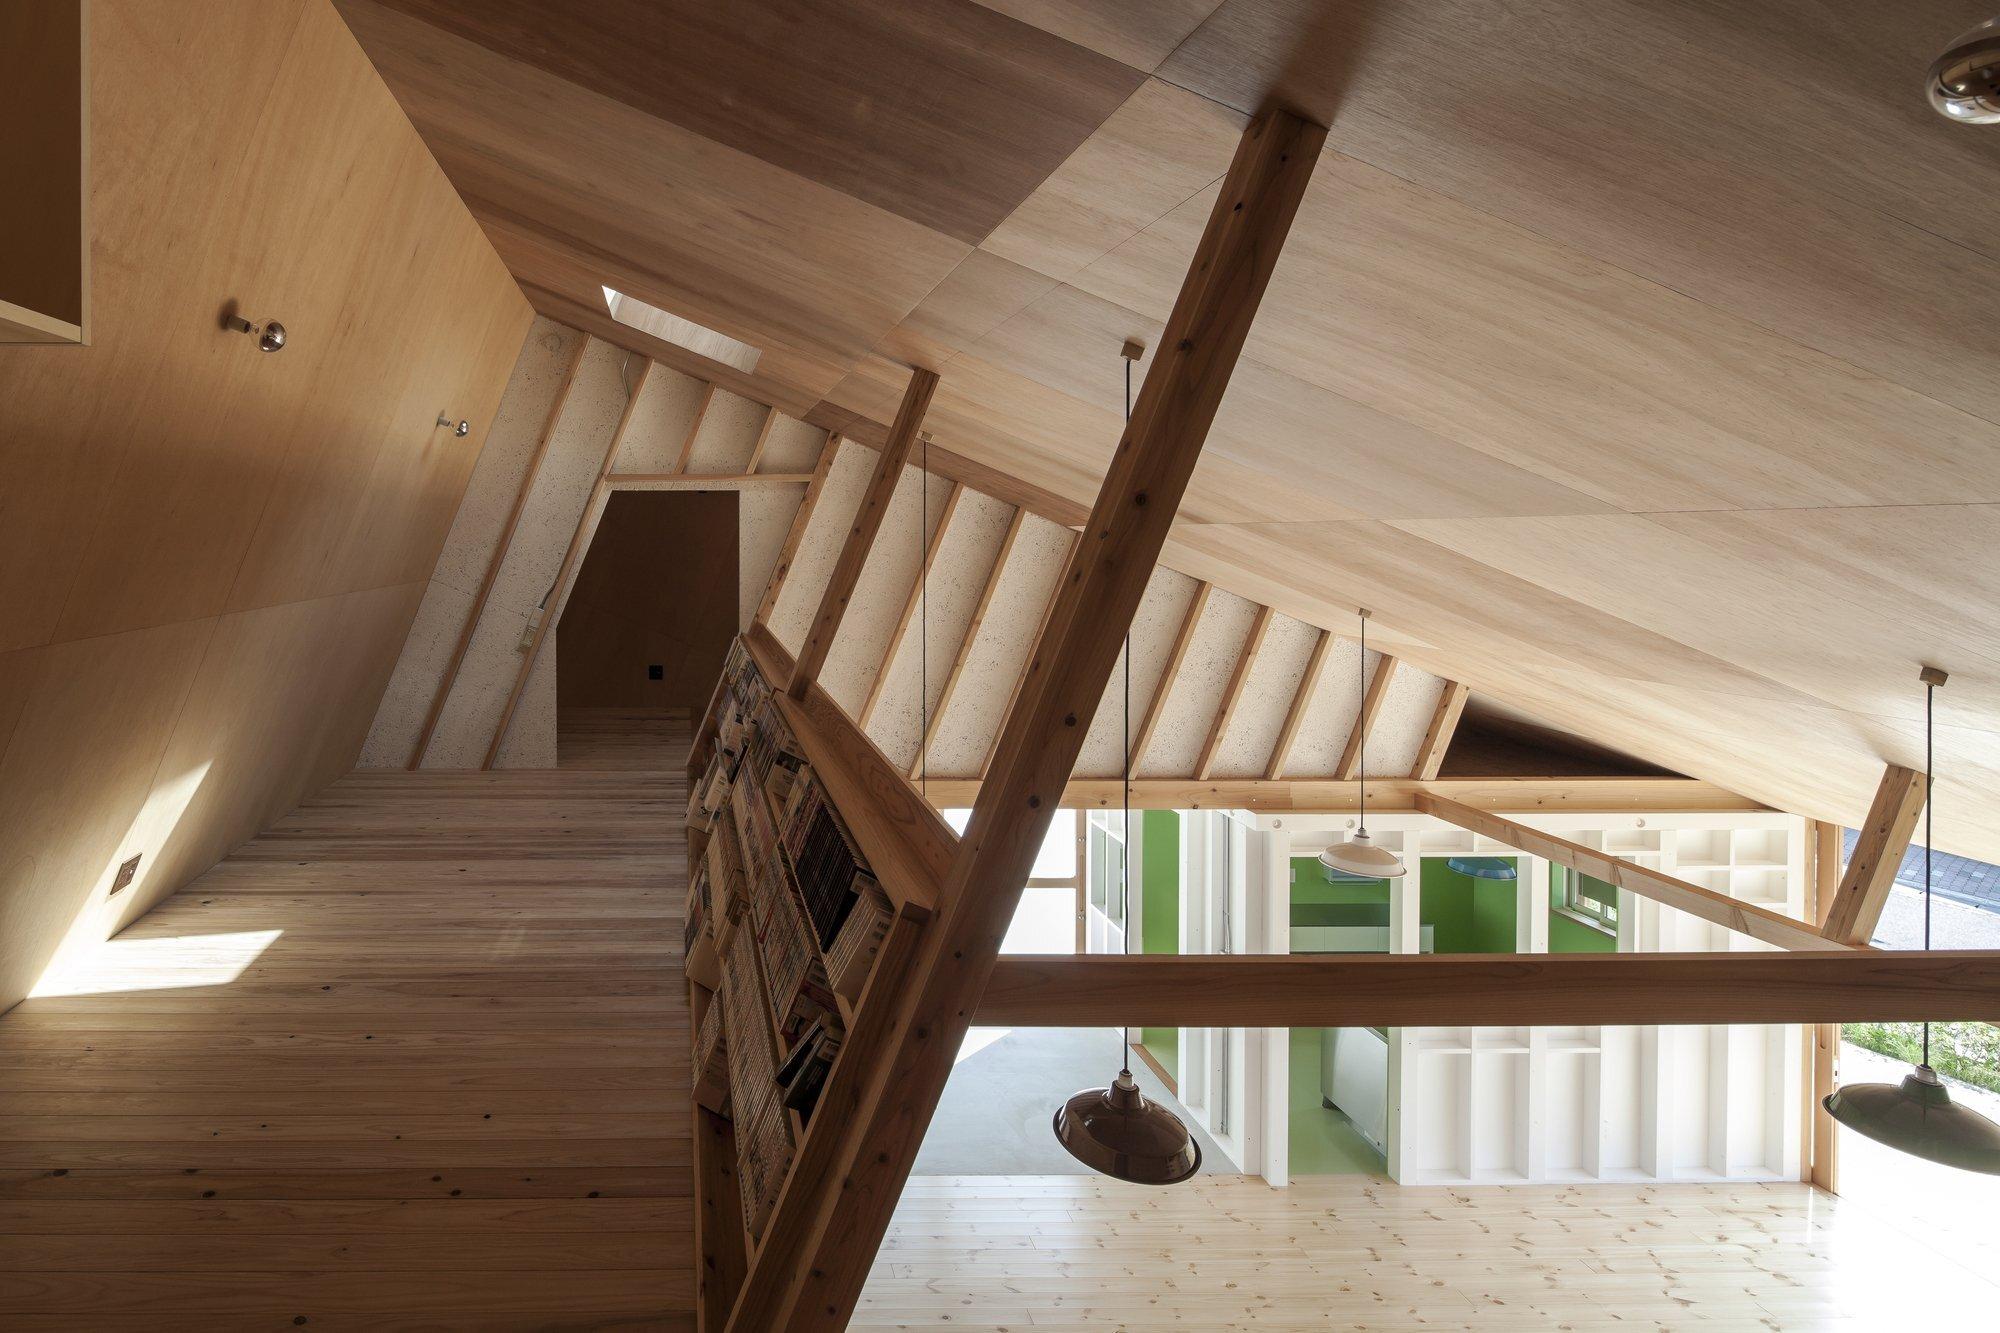 Loft apartment bedroom: loft interior design style in home ...